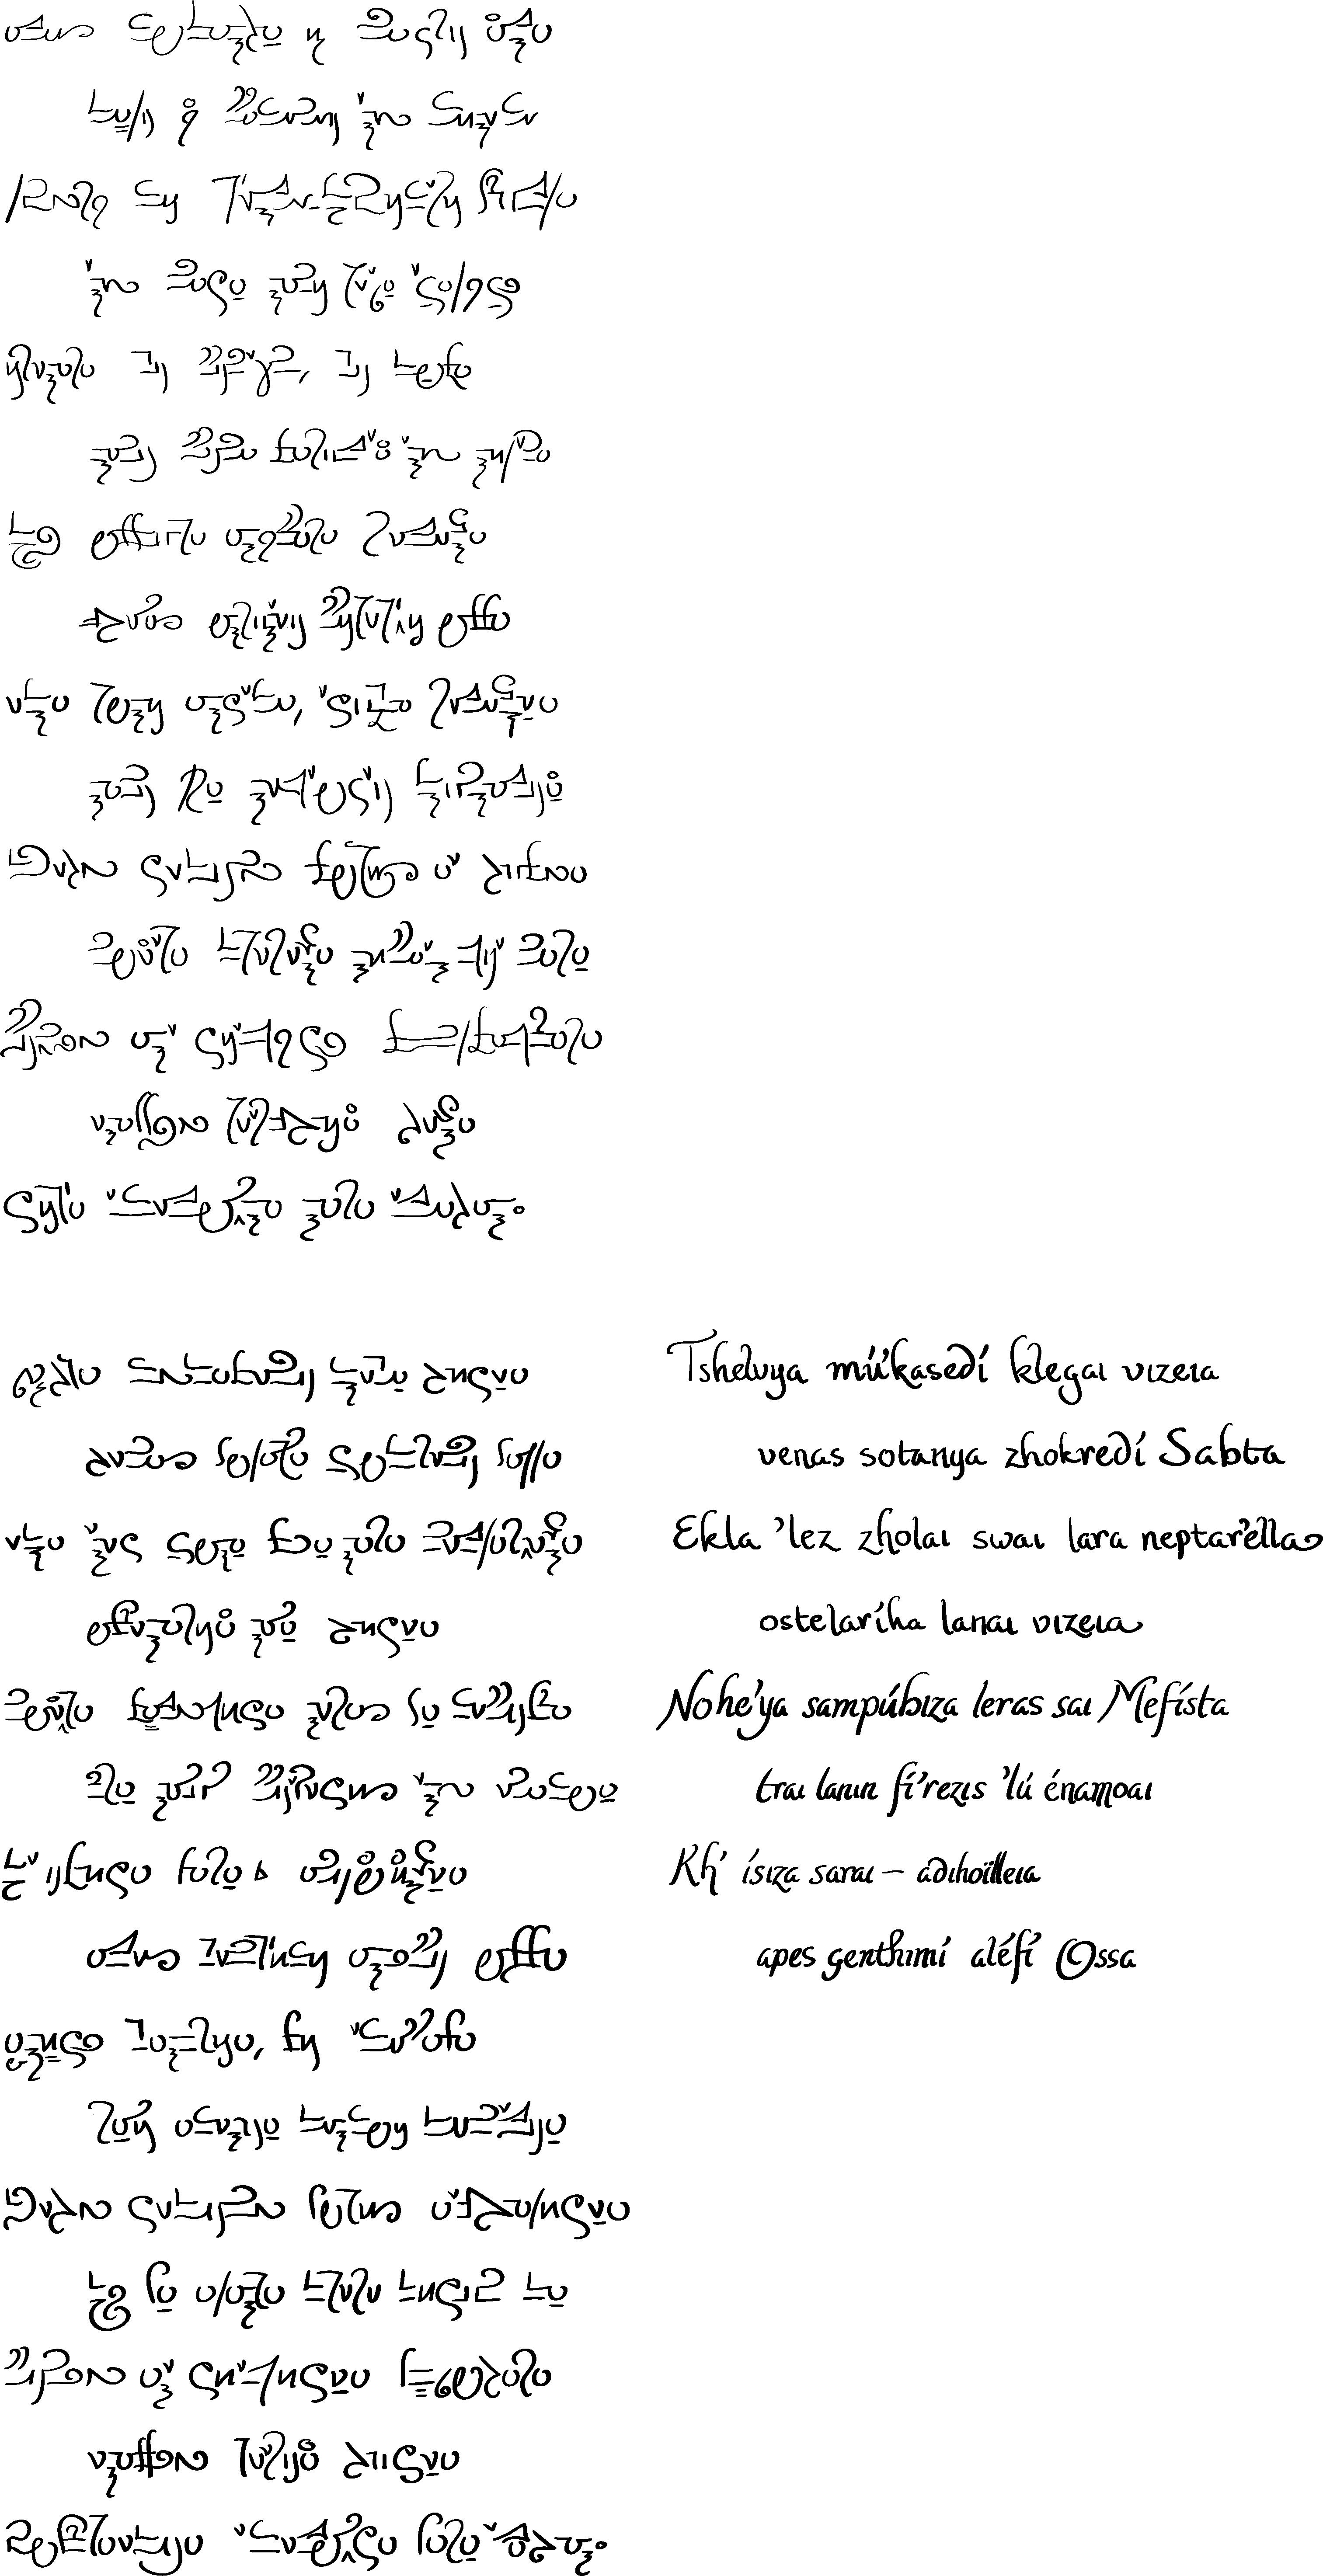 thelpeli-khrimria.png